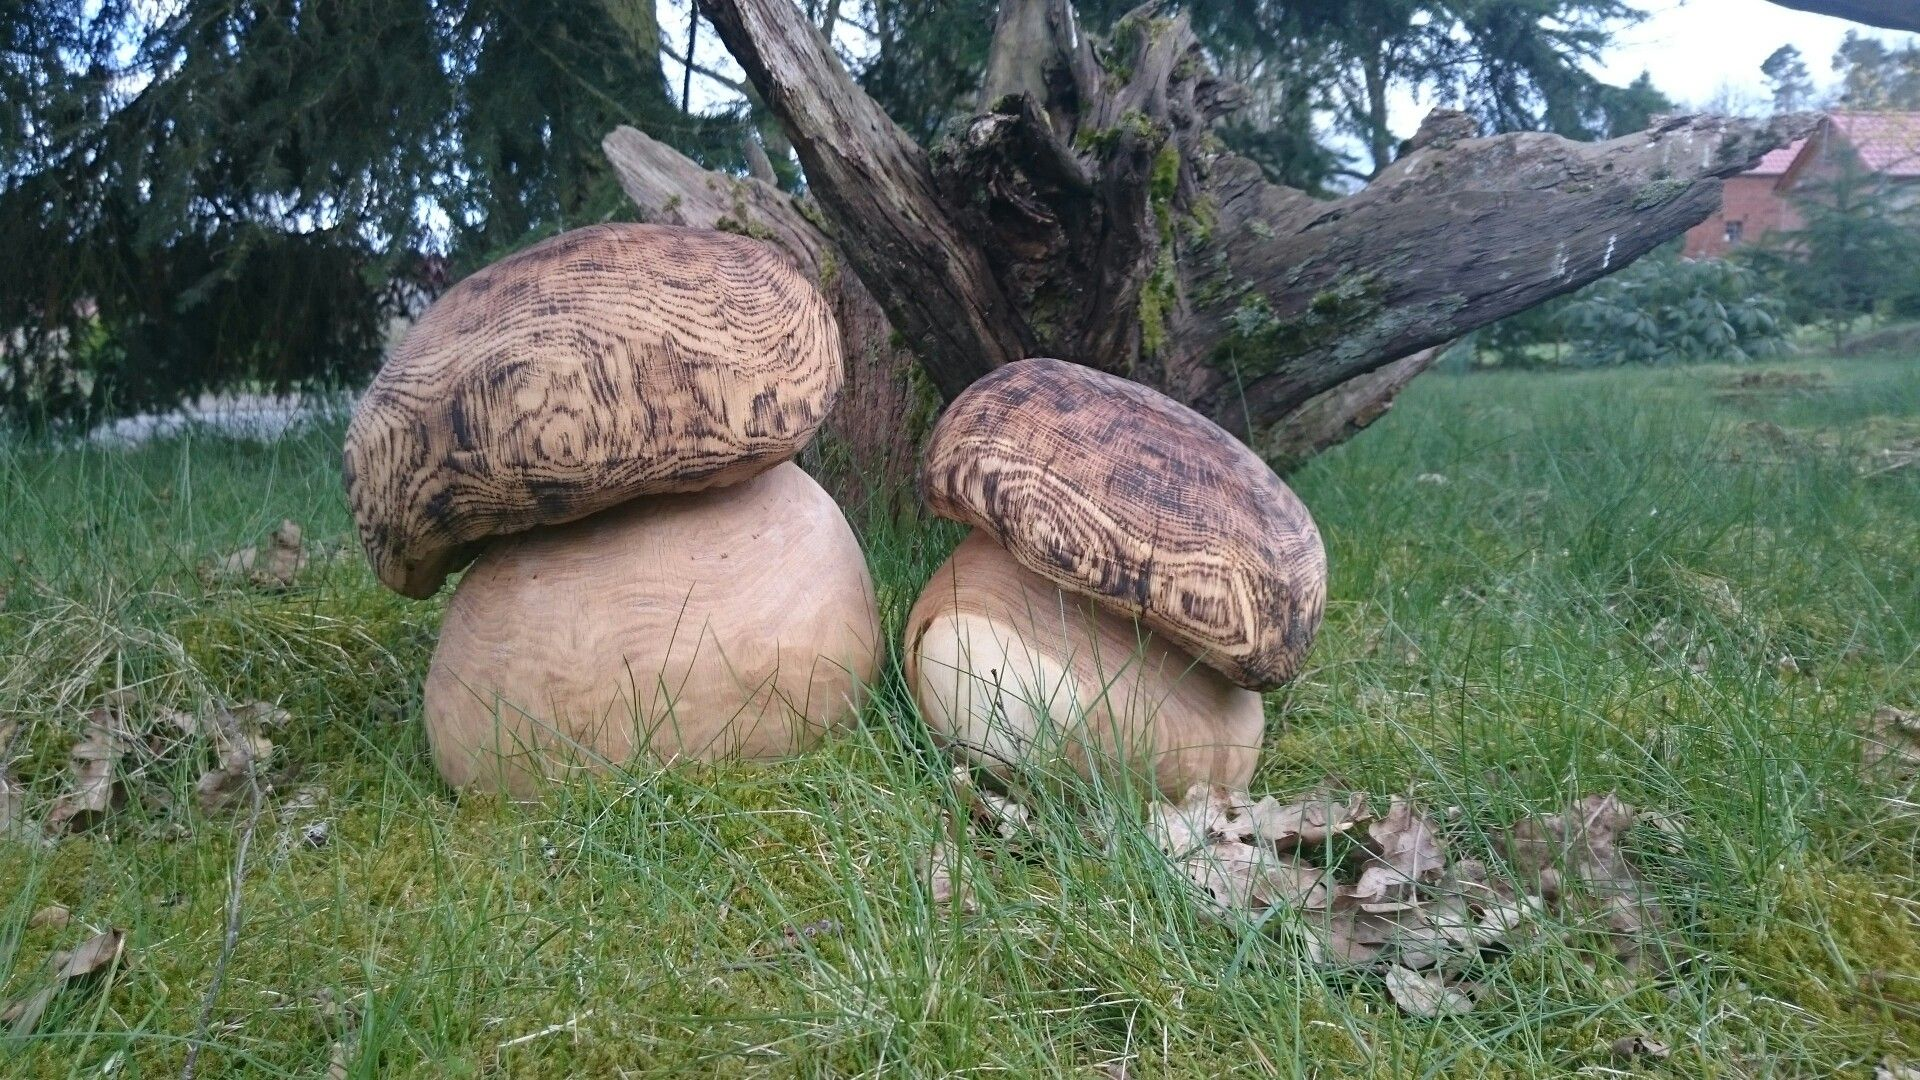 kettensägenkunst pilze | carving fred | pinterest